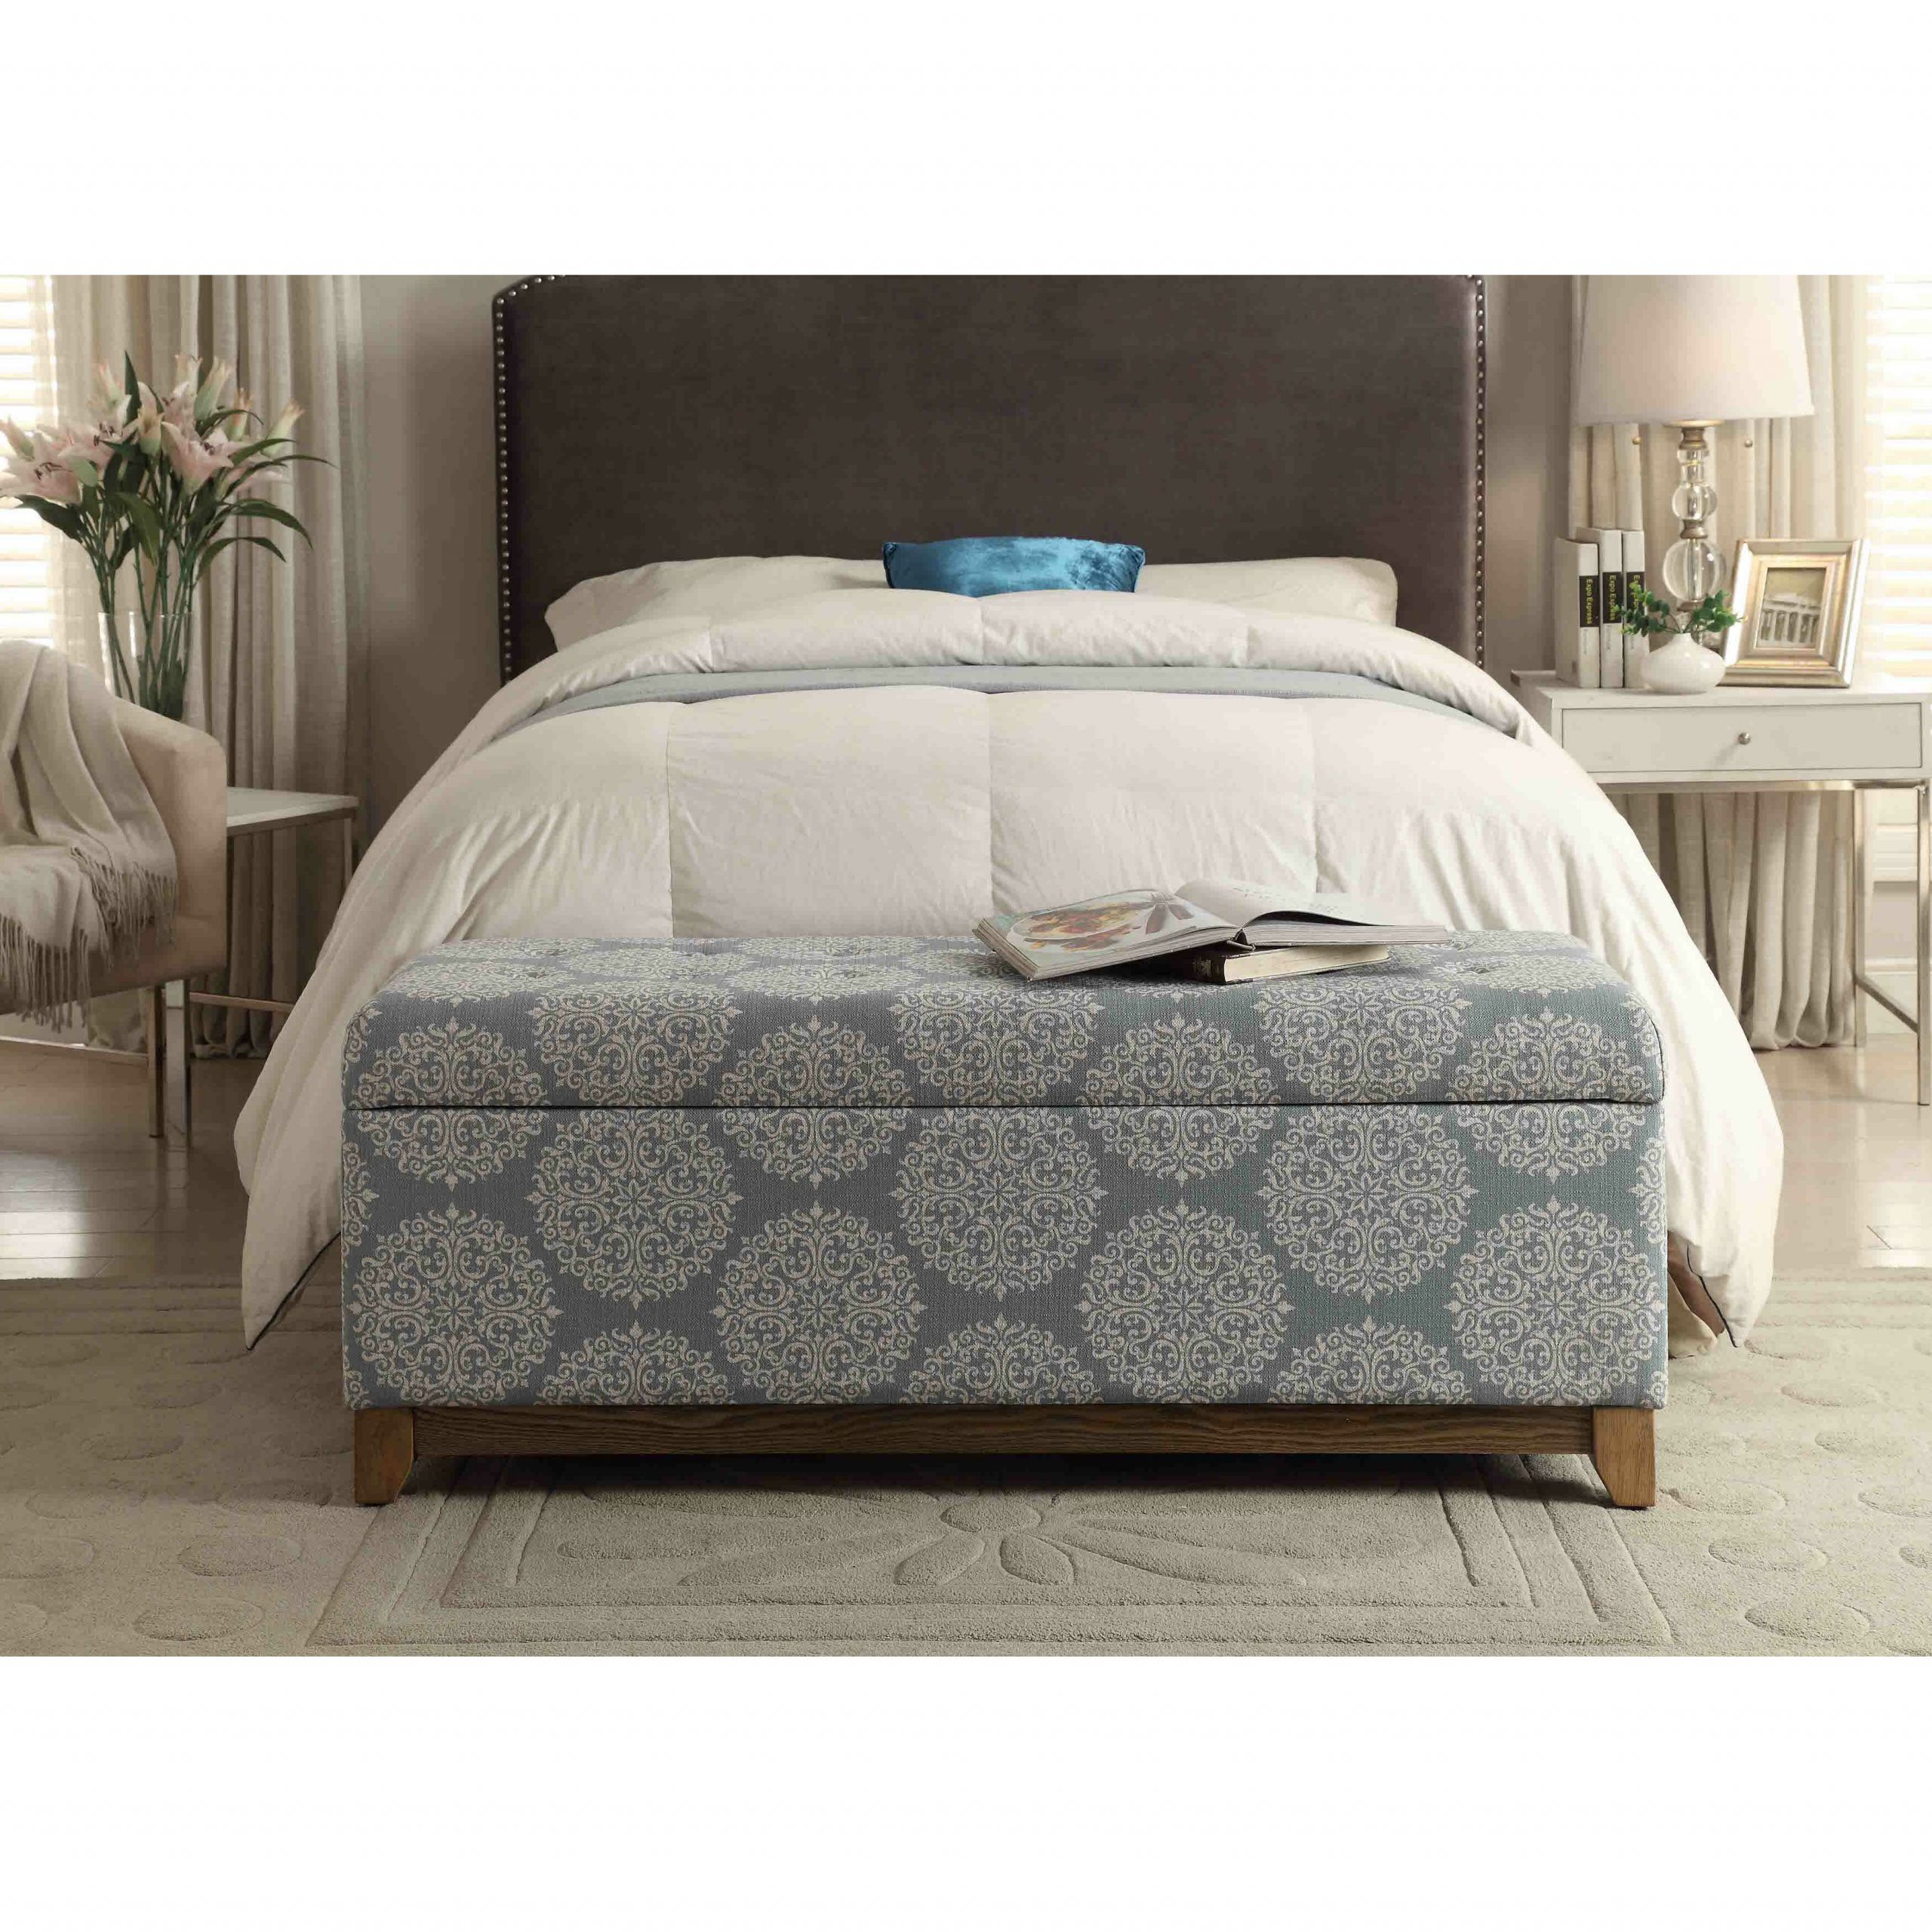 Storage Bench Bedroom  Bungalow Rose Navya Wood Storage Bedroom Bench & Reviews